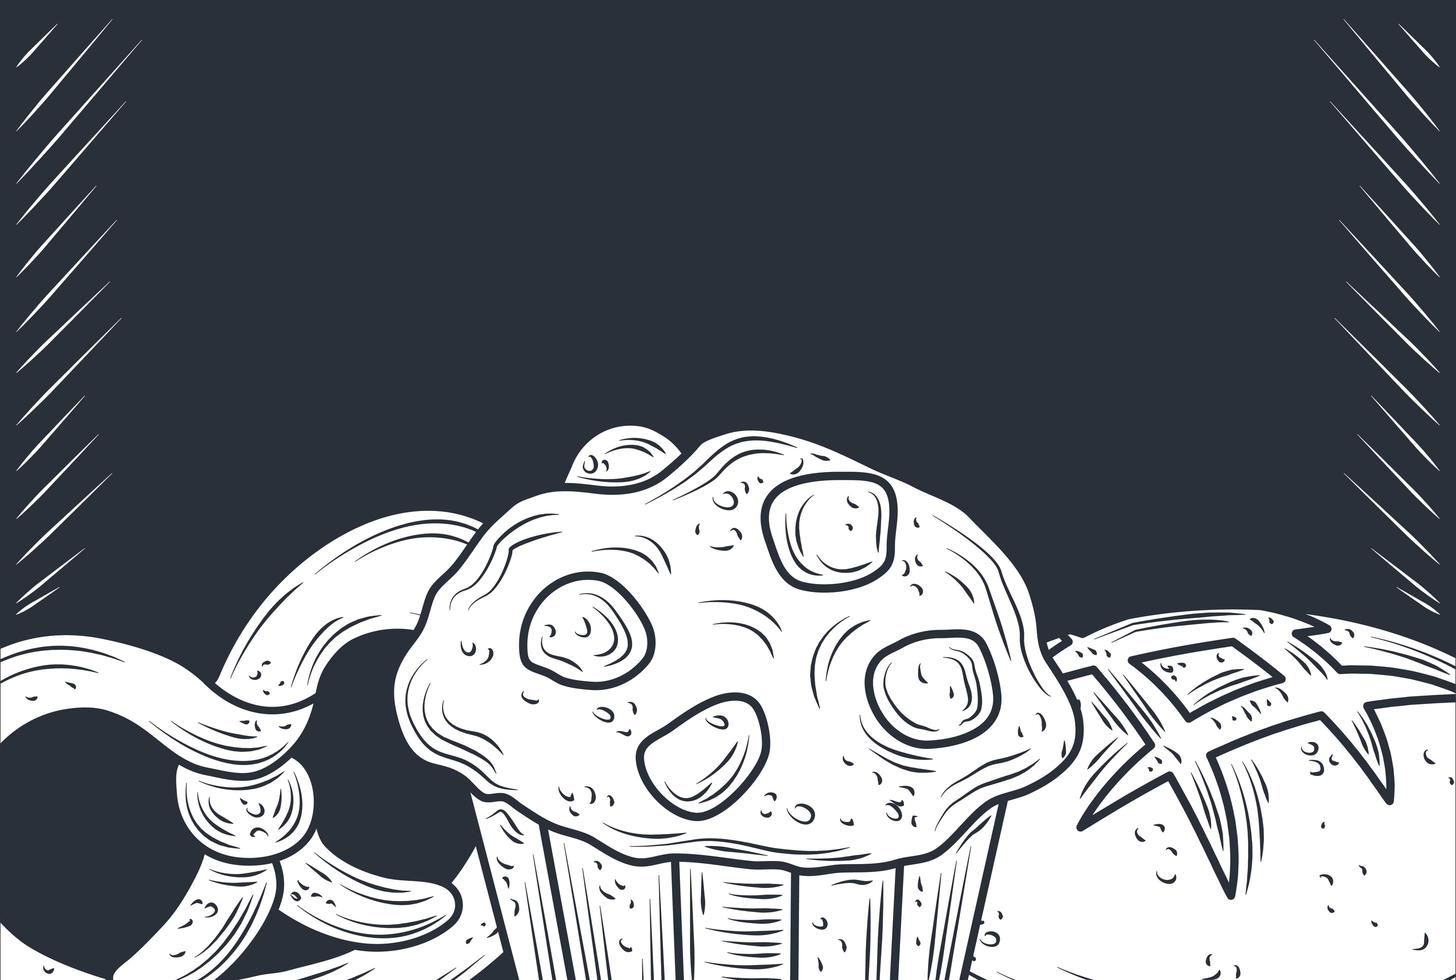 gebakken voedsel vintage banner achtergrond vector